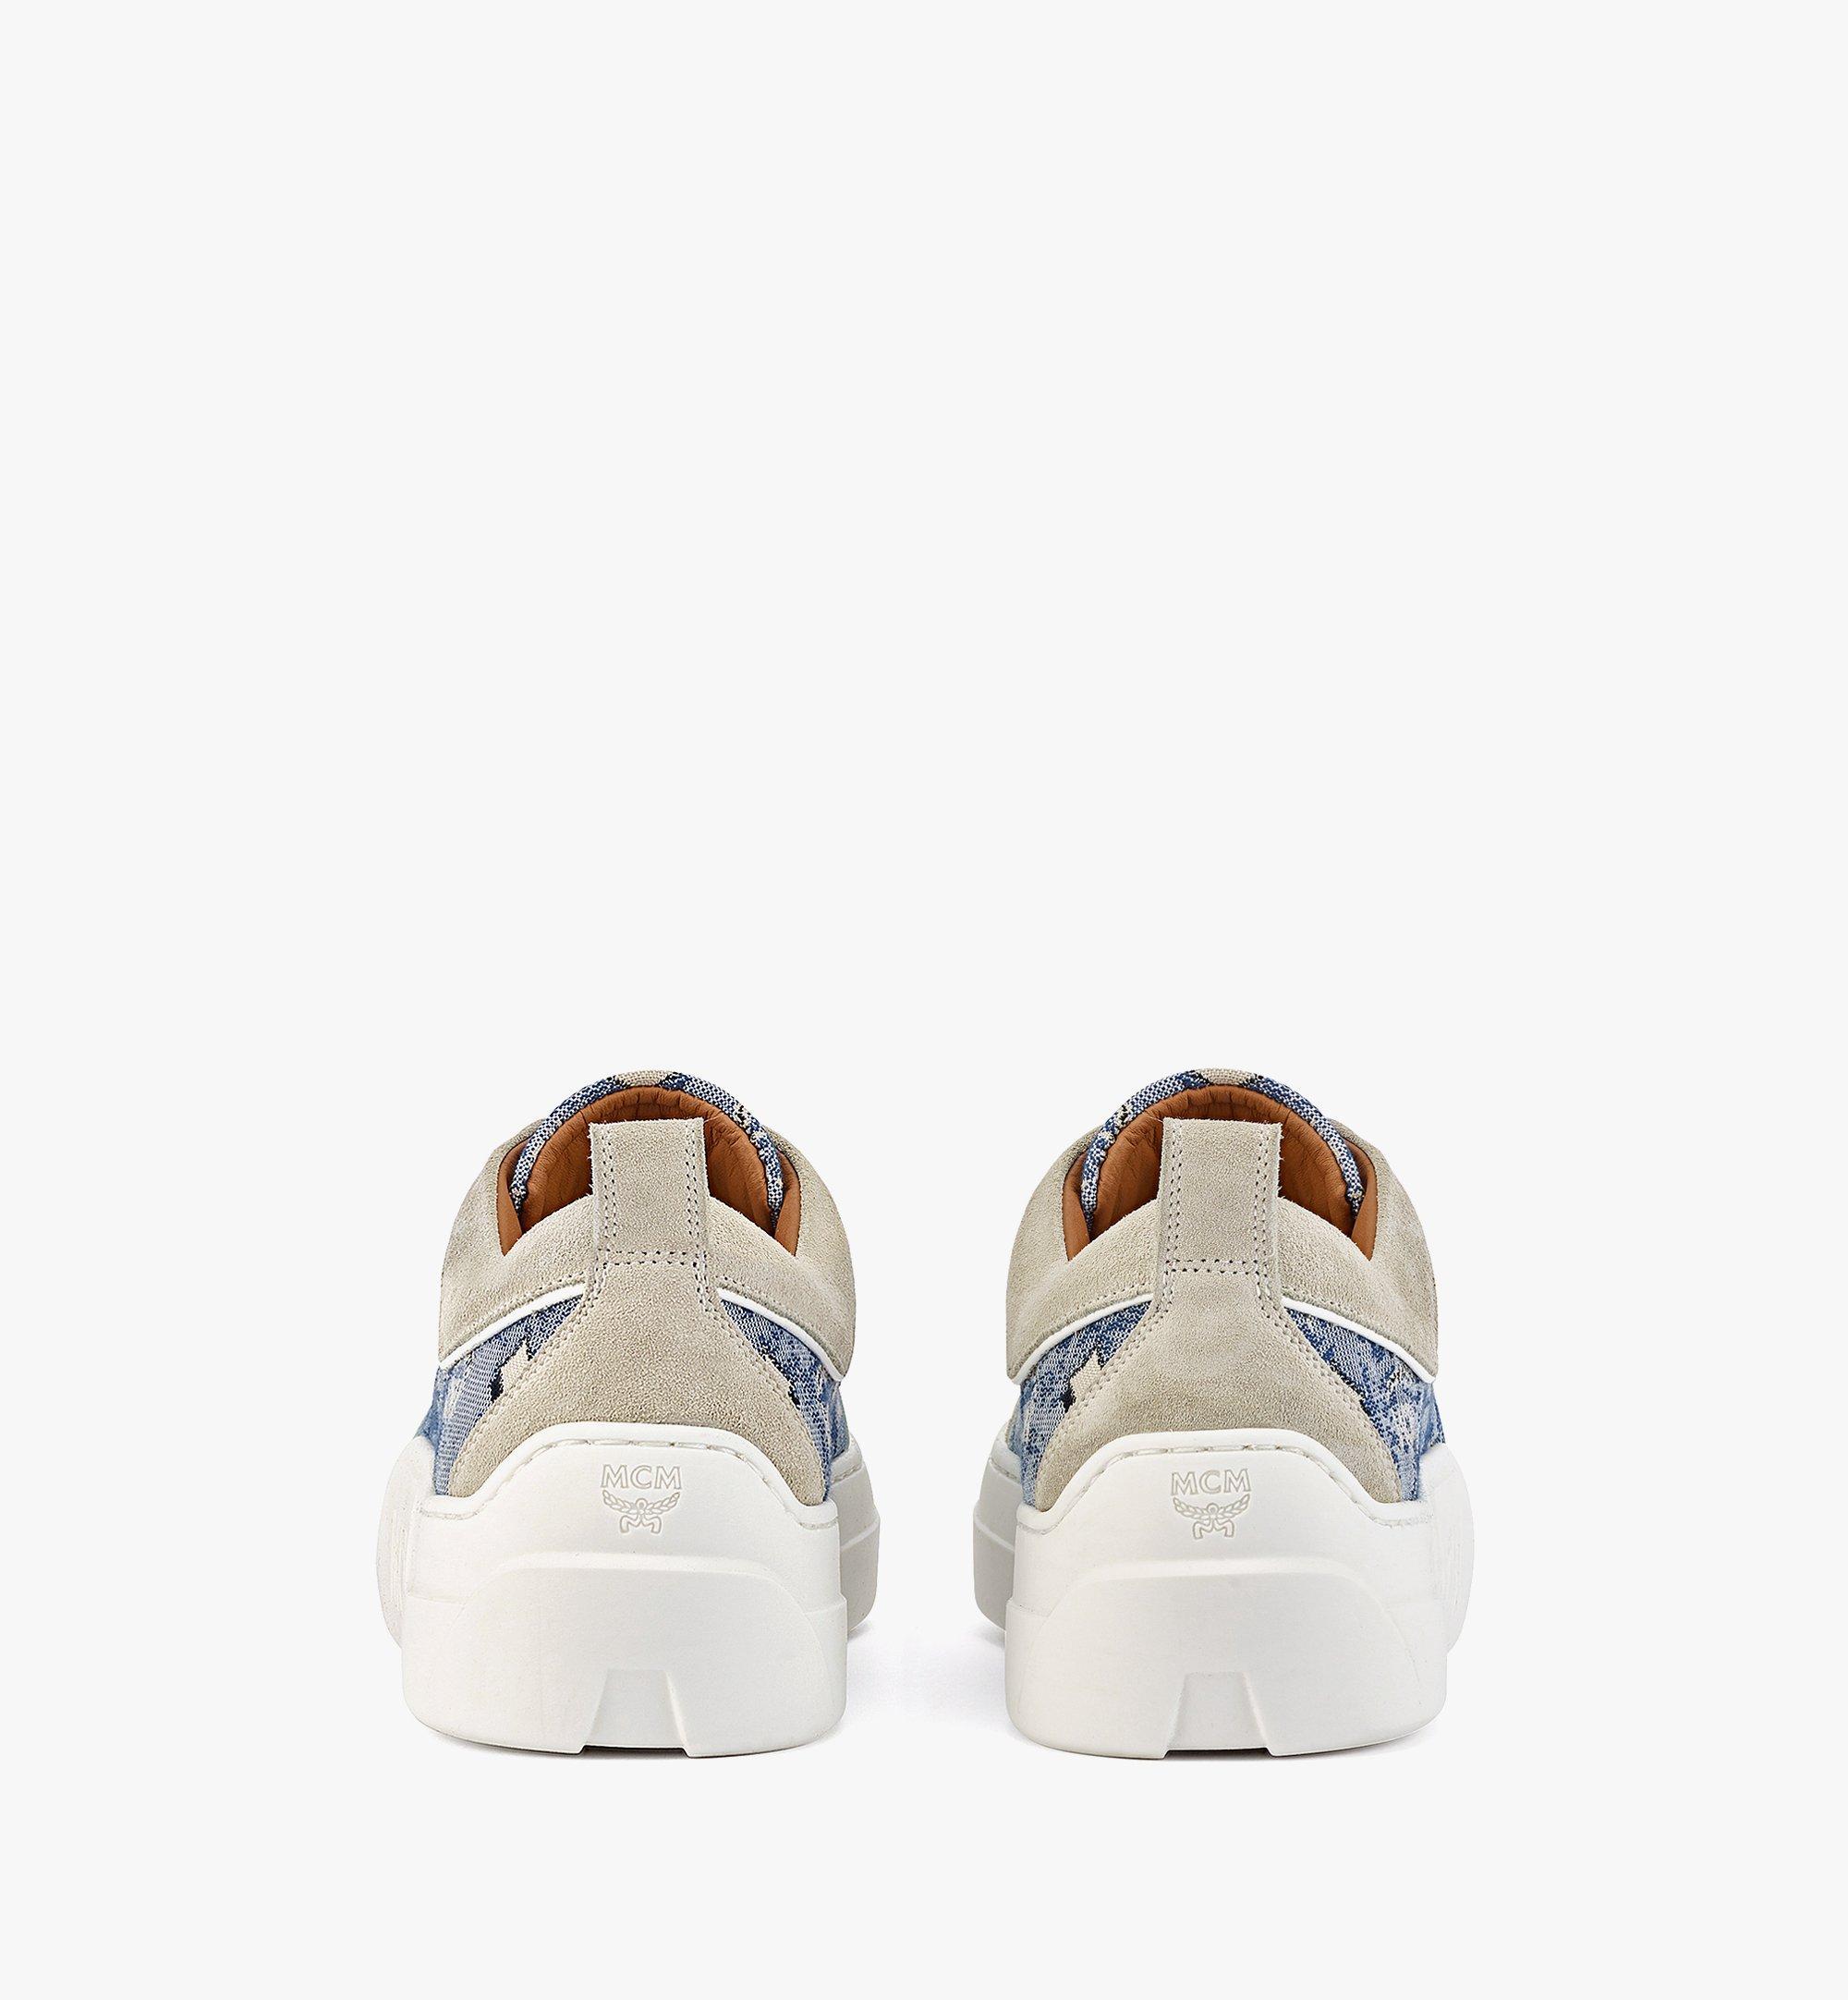 MCM Women's Skyward Platform Sneakers in Vintage Jacquard Monogram Blue MESBATQ03LU037 Alternate View 2